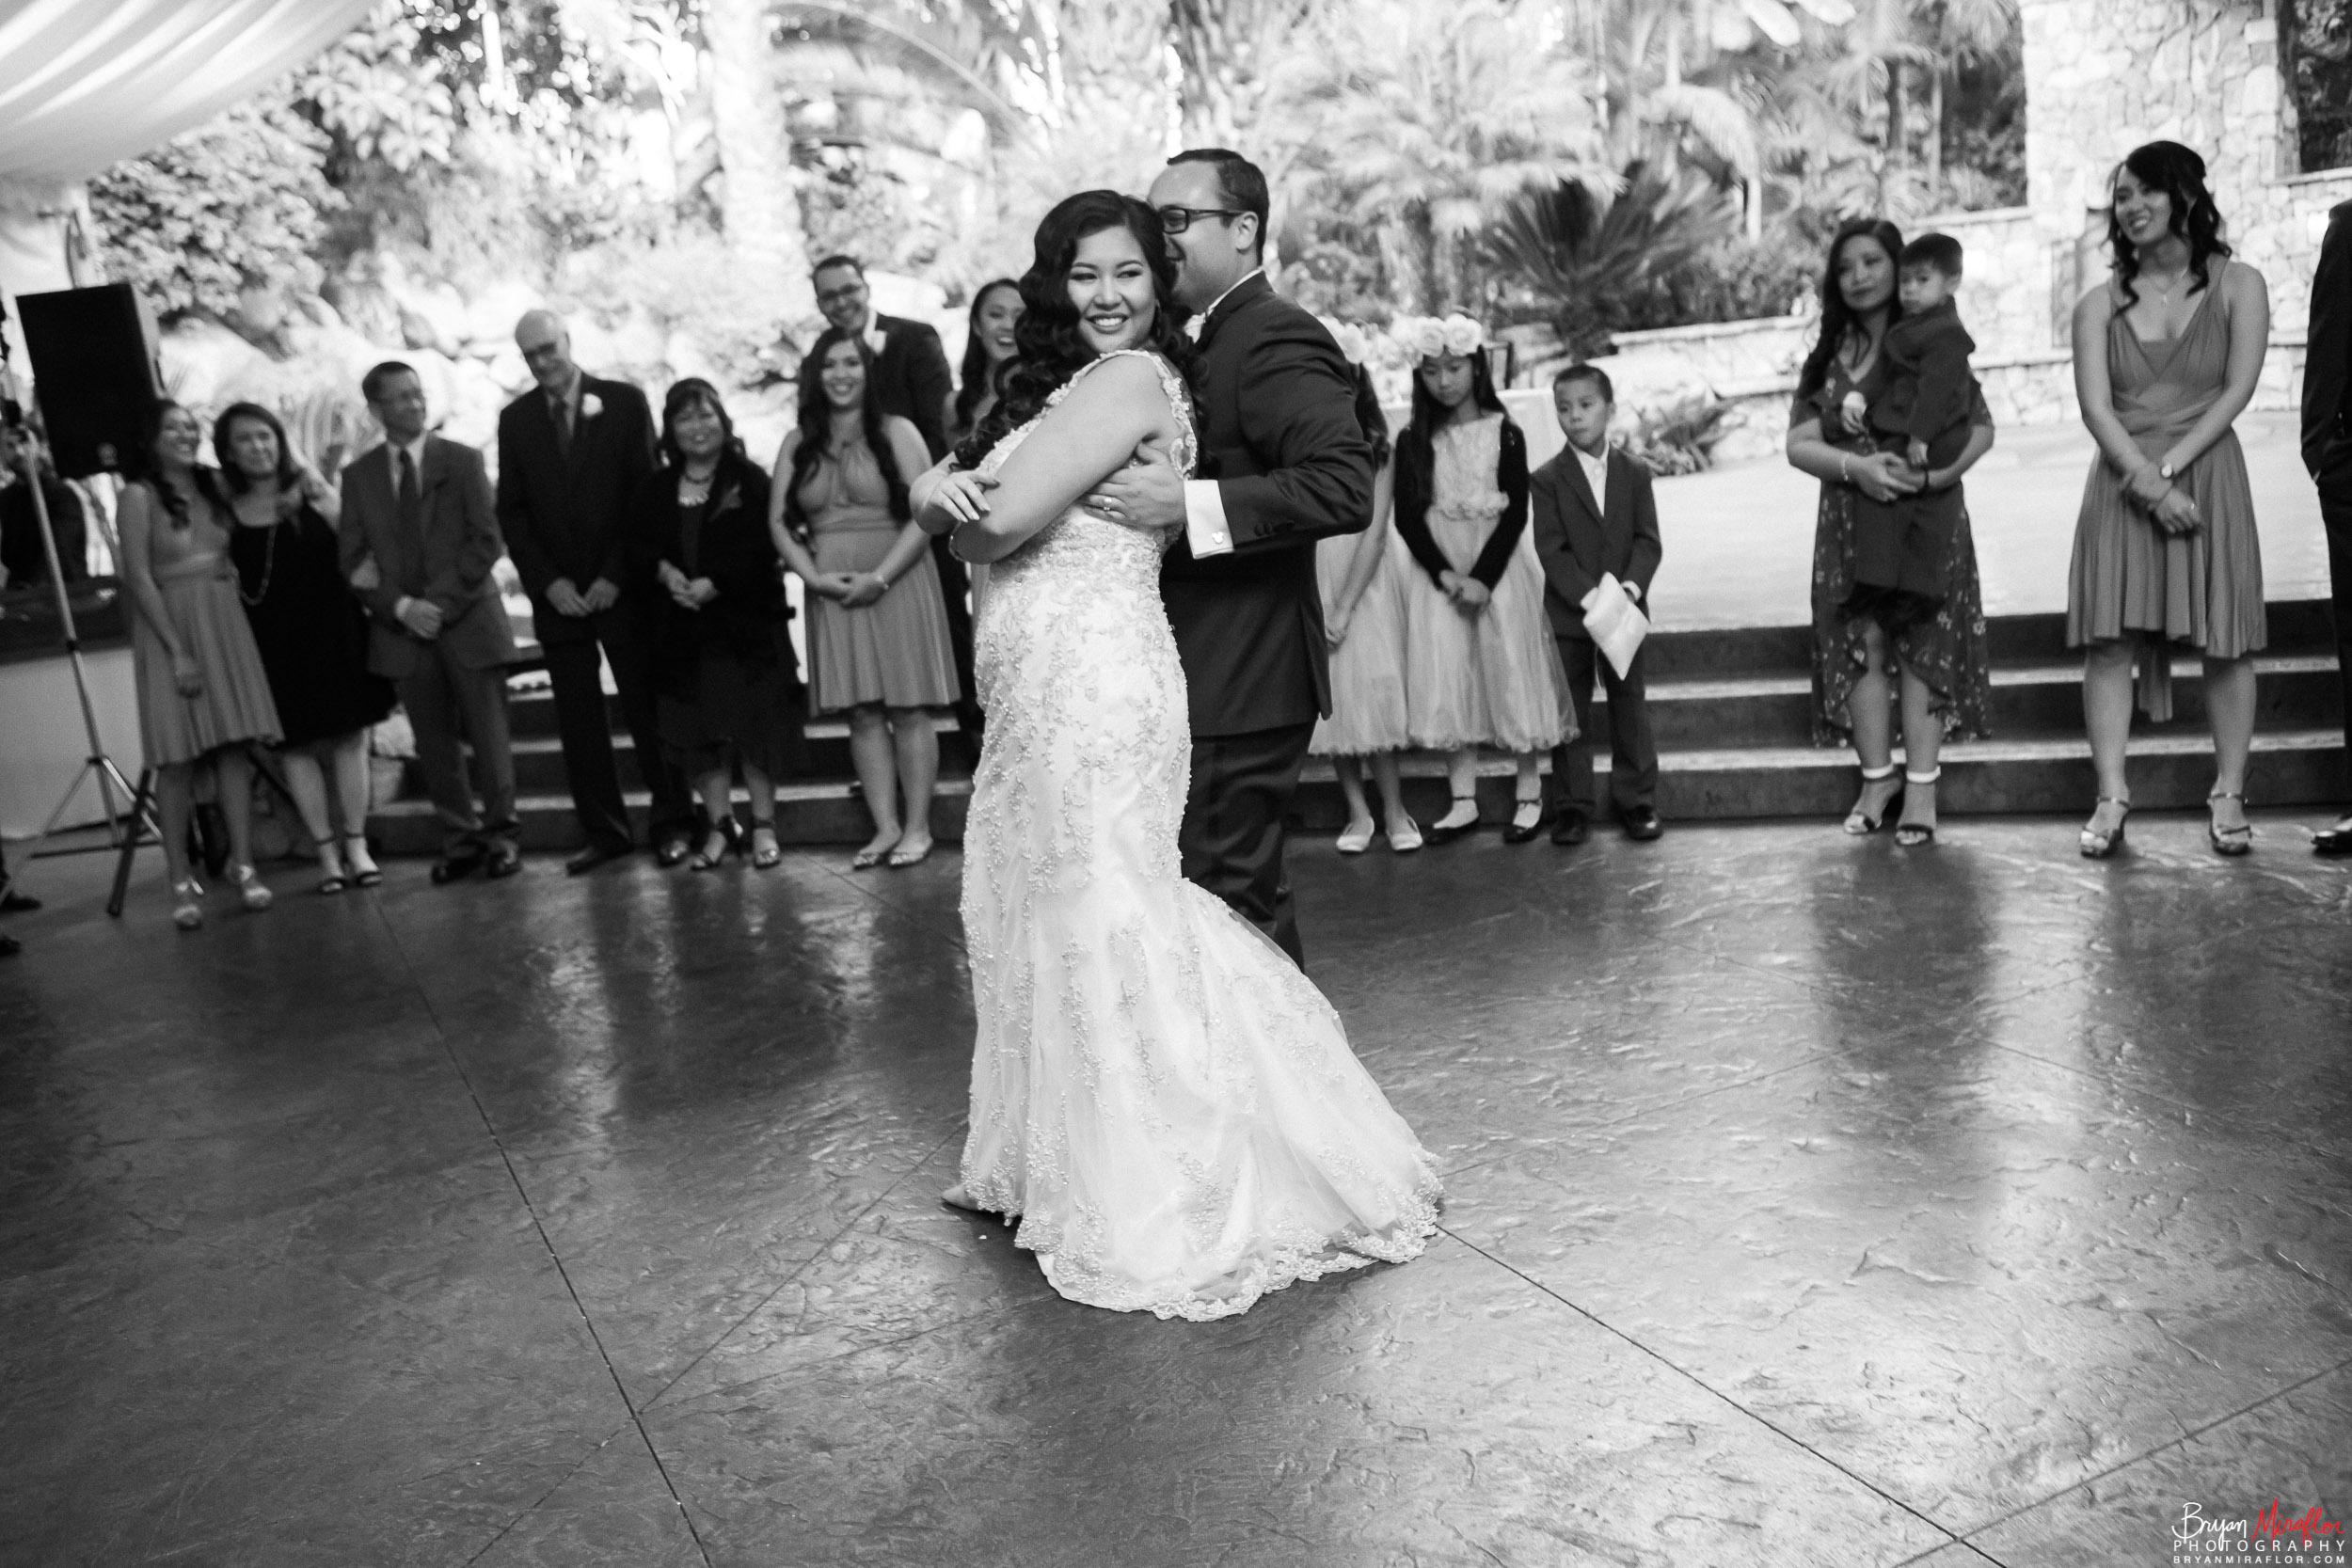 Bryan-Miraflor-Photography-Hannah-Jonathan-Married-Grand-Traditions-Estate-Gardens-Fallbrook-20171222-182.jpg